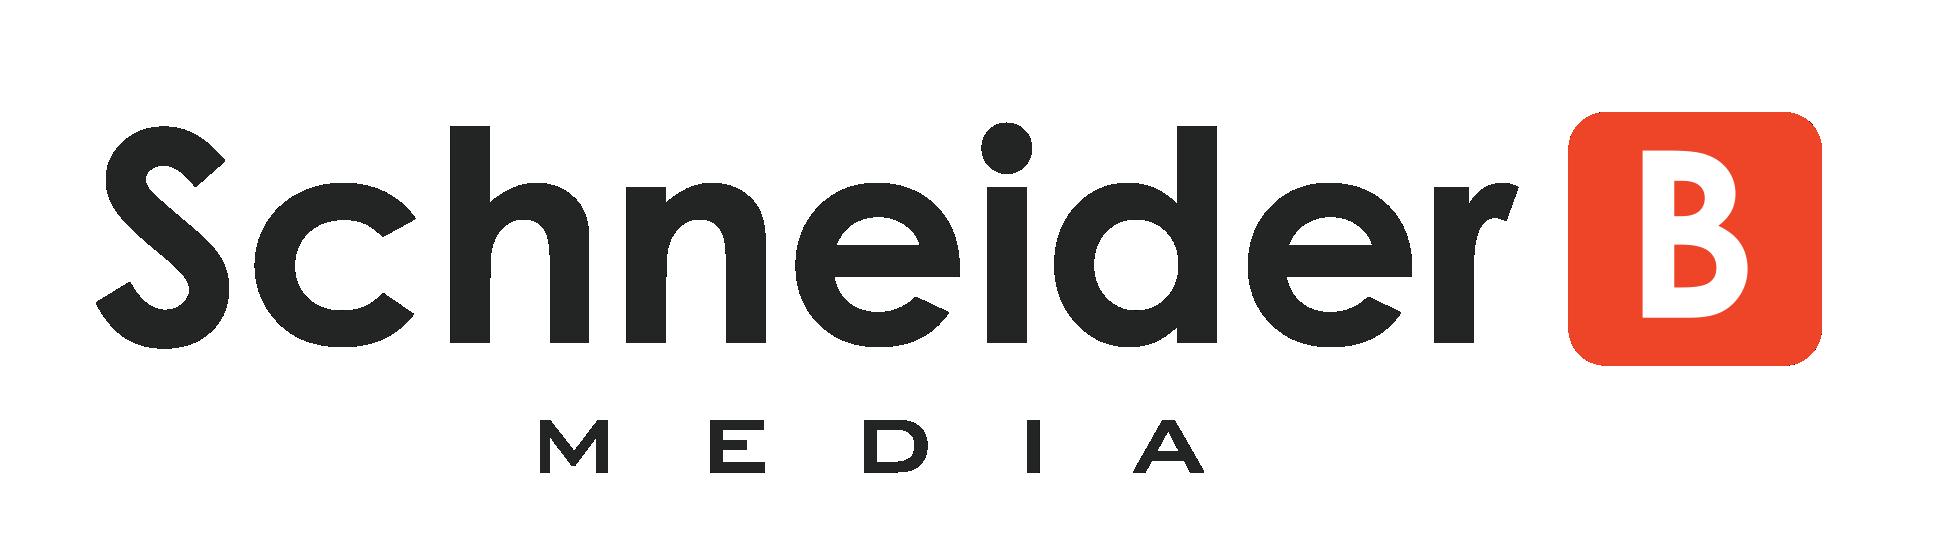 SchneiderB Media Logo